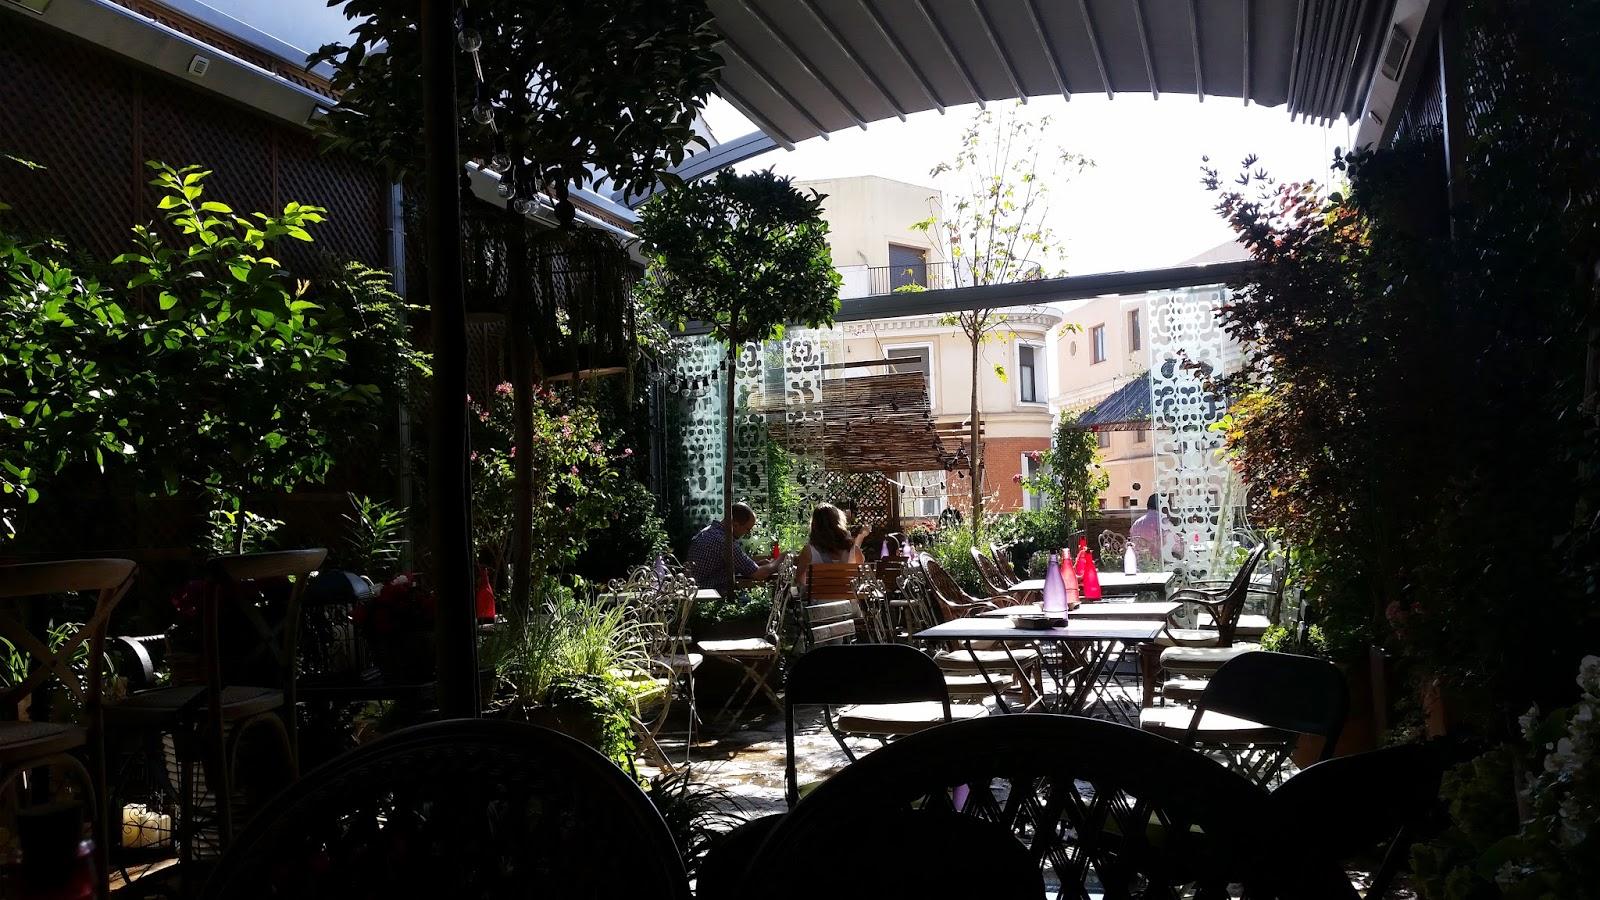 Yo solo quiero aprender algo nuevo hoy he probado el for Shunga jardin secreto